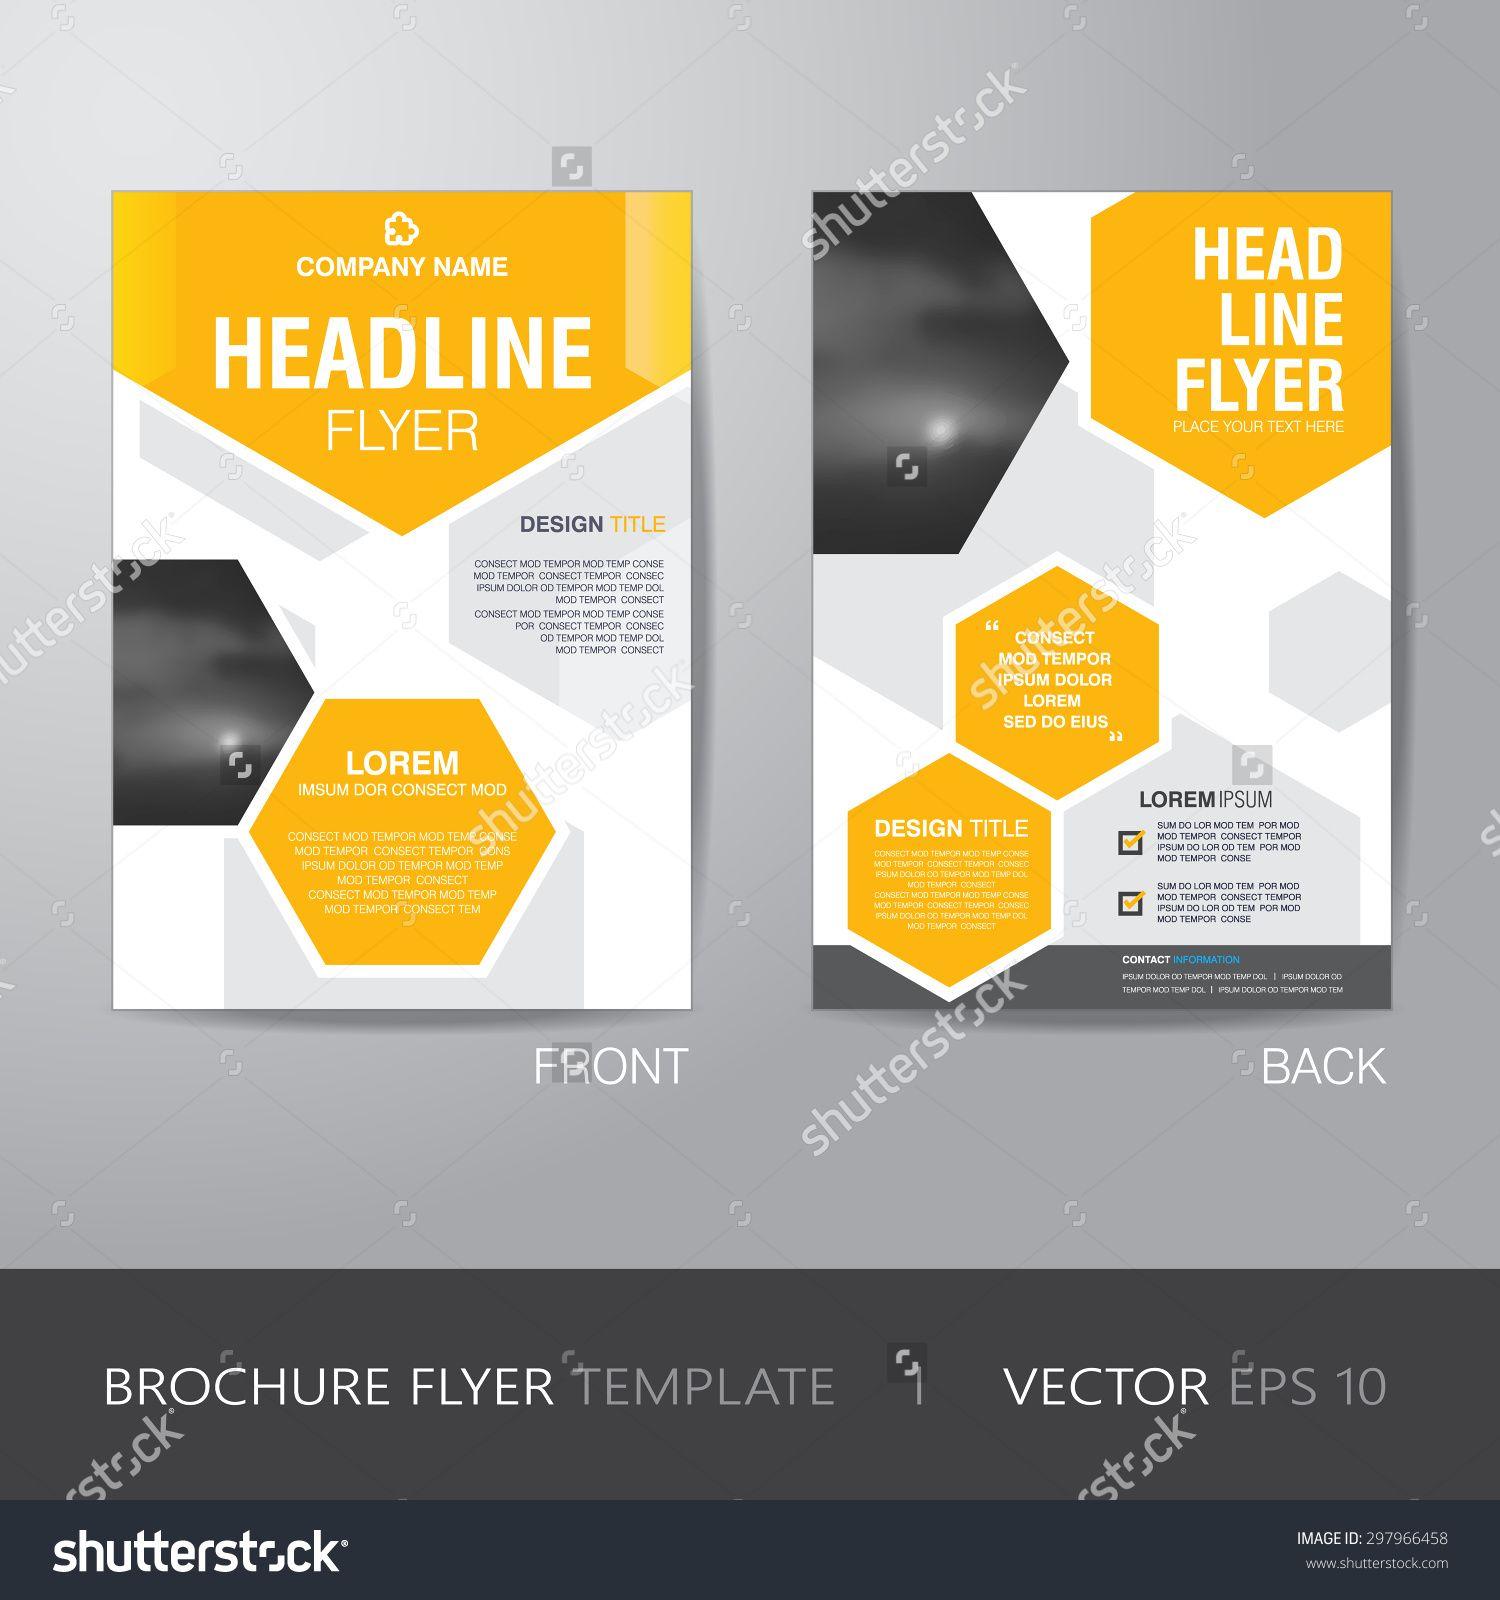 Pin By Joey On Portfolio Graphic Design Flyer Flyer Design